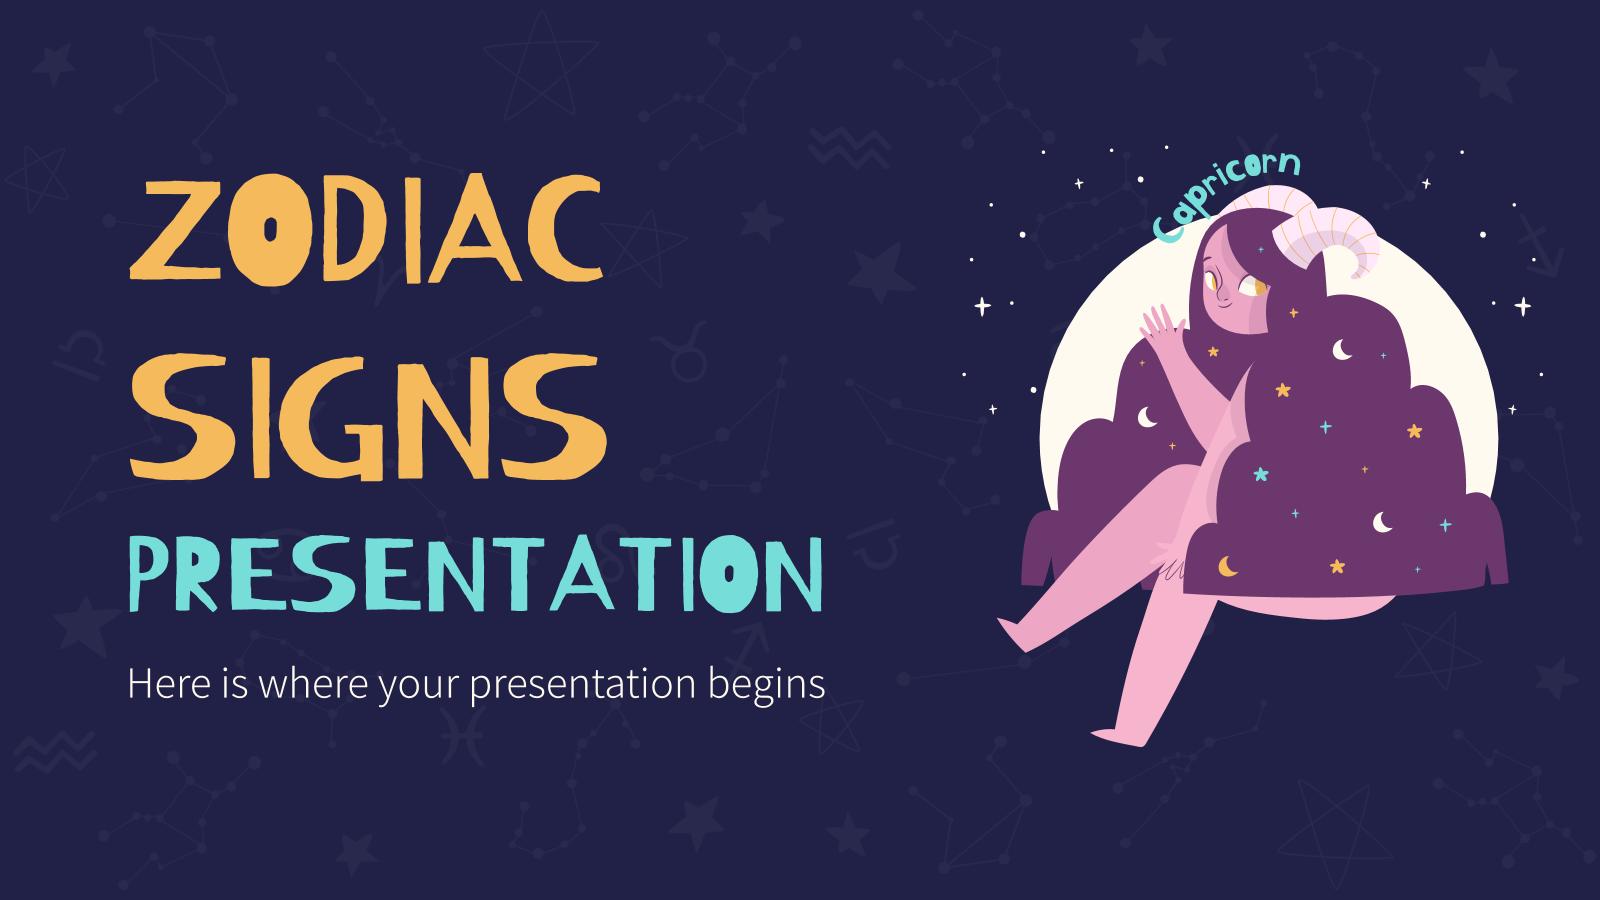 Zodiac Signs presentation template